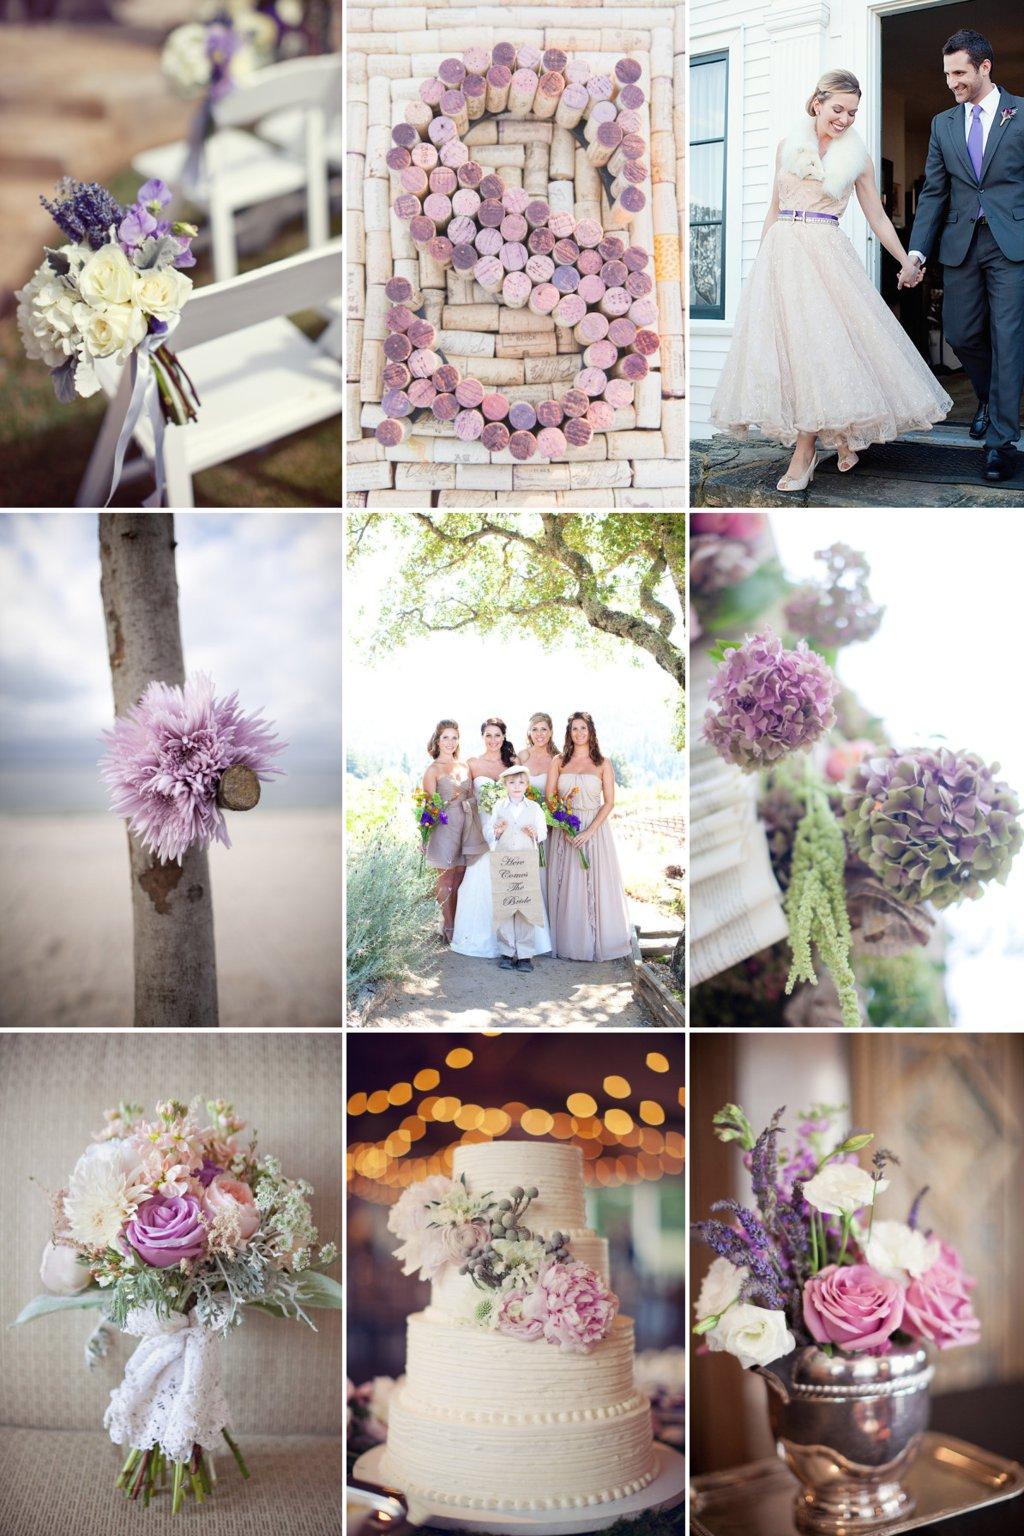 Romantic-wedding-color-inspiration-soft-plum-lilac-lavendar.full